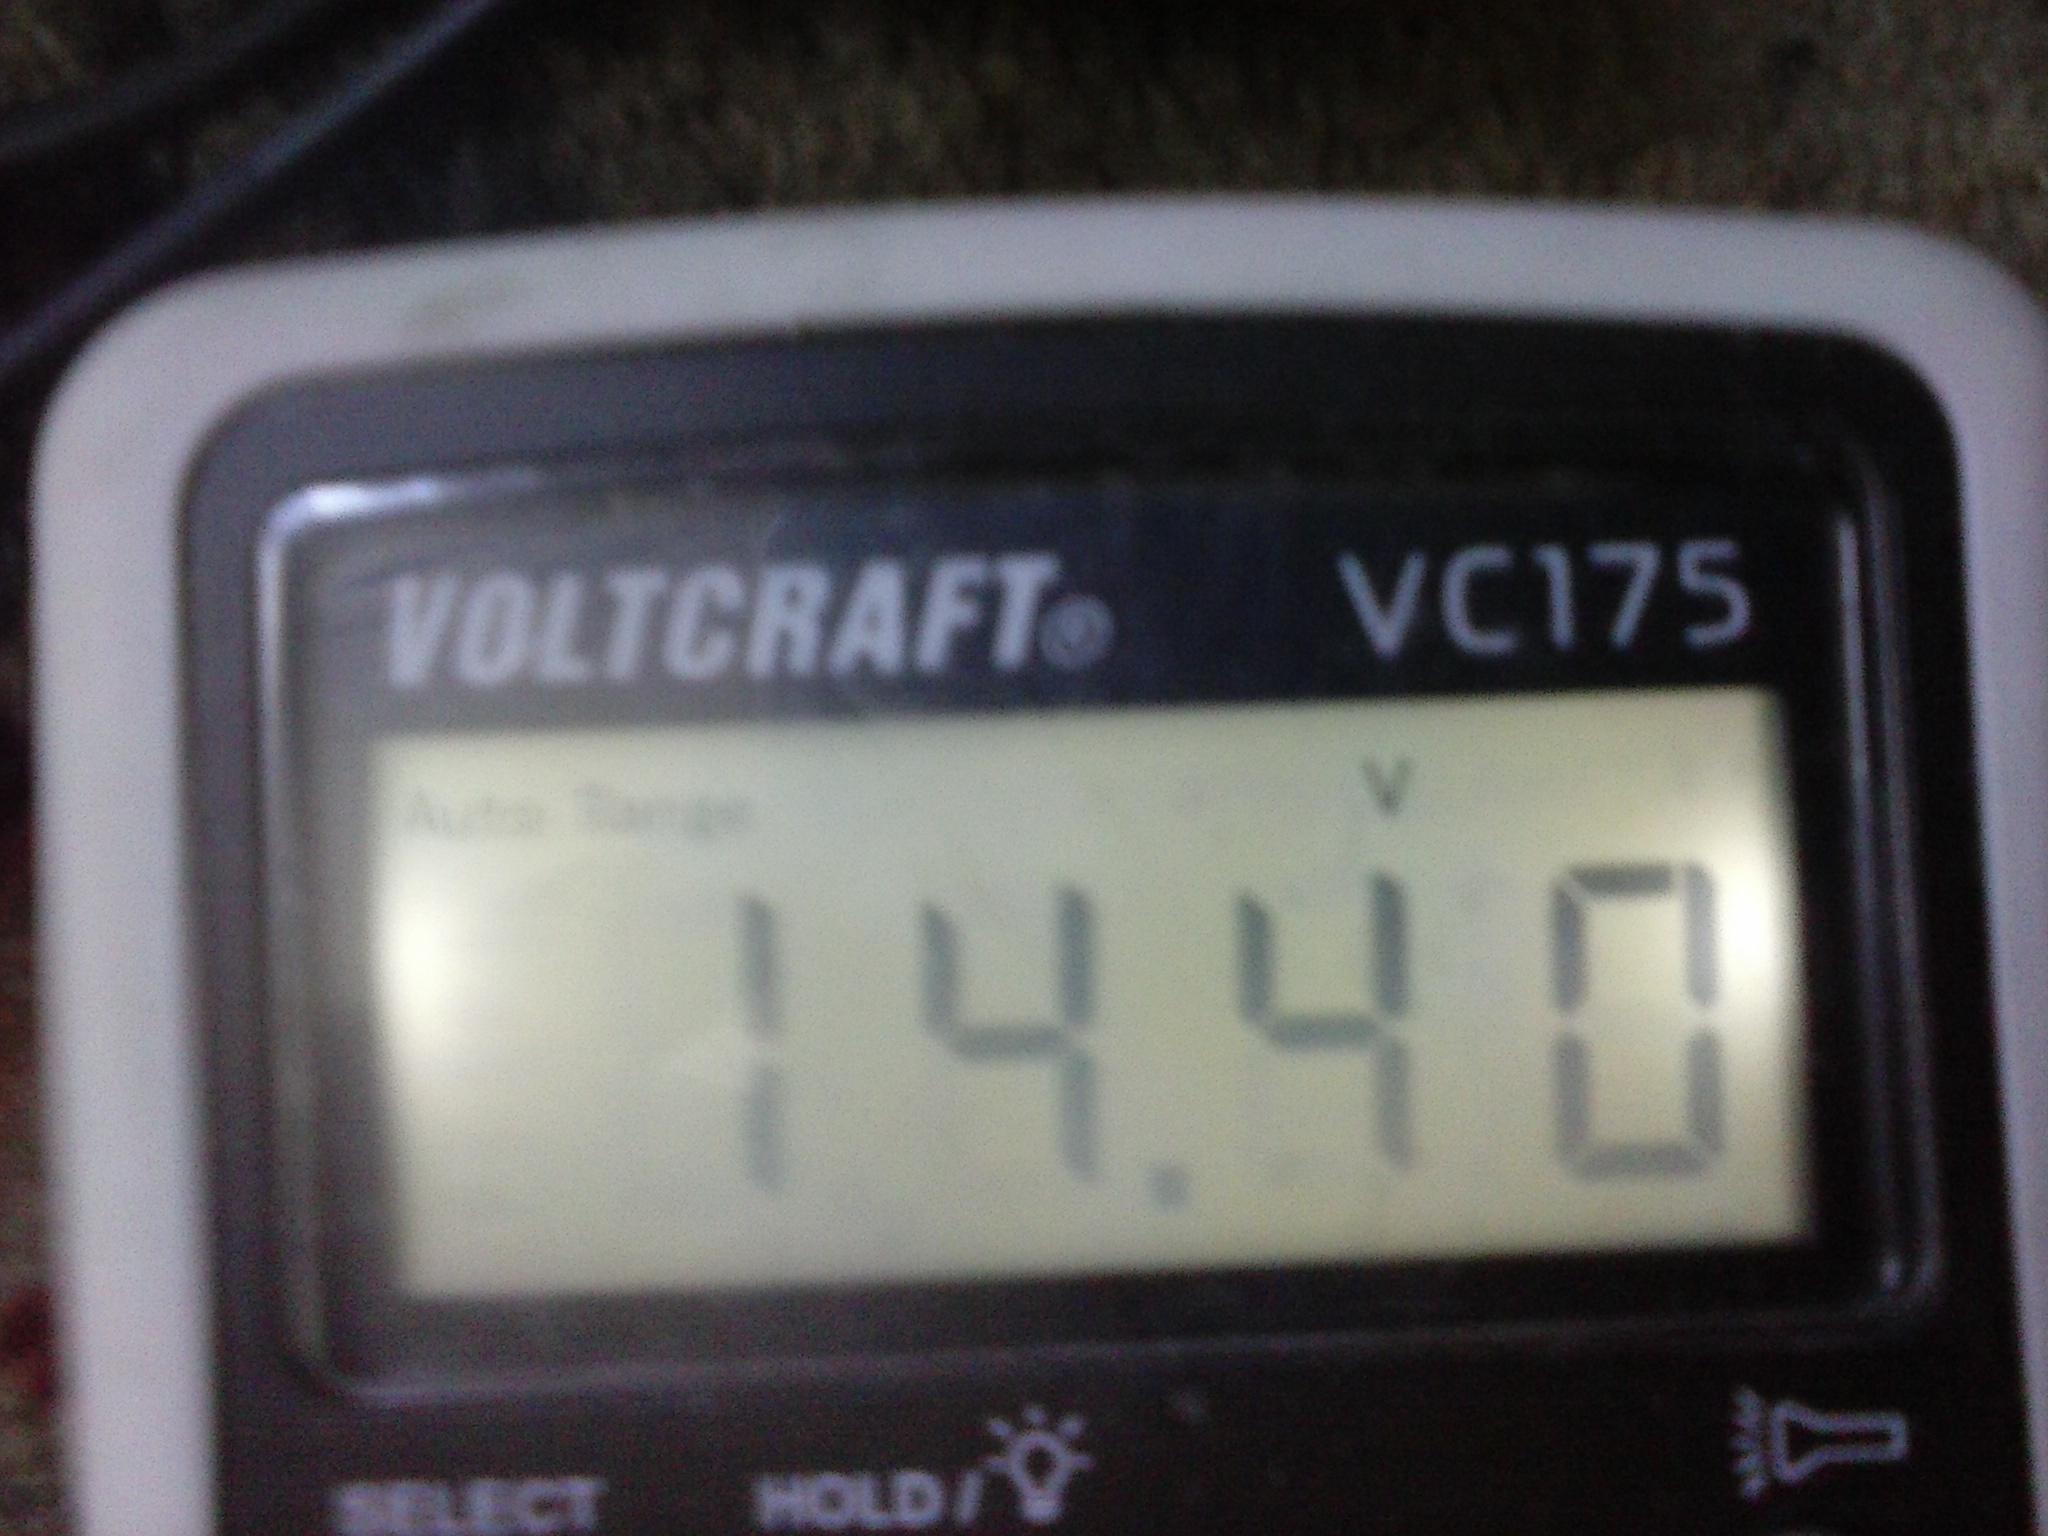 Prostownik do akumulator�w  12 volt.